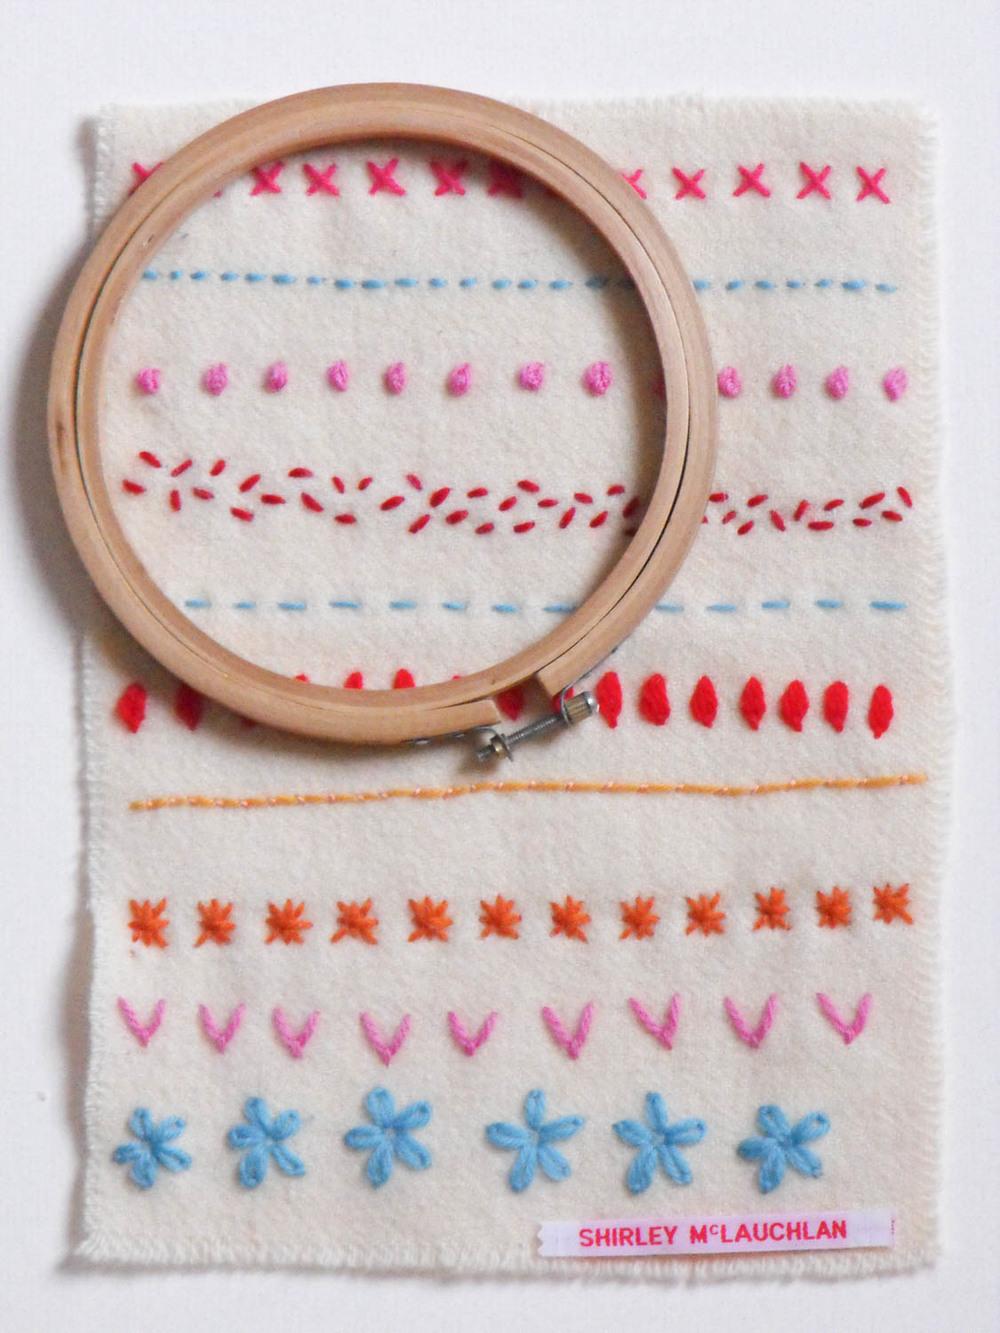 Stitches & hoop-2_web.jpg